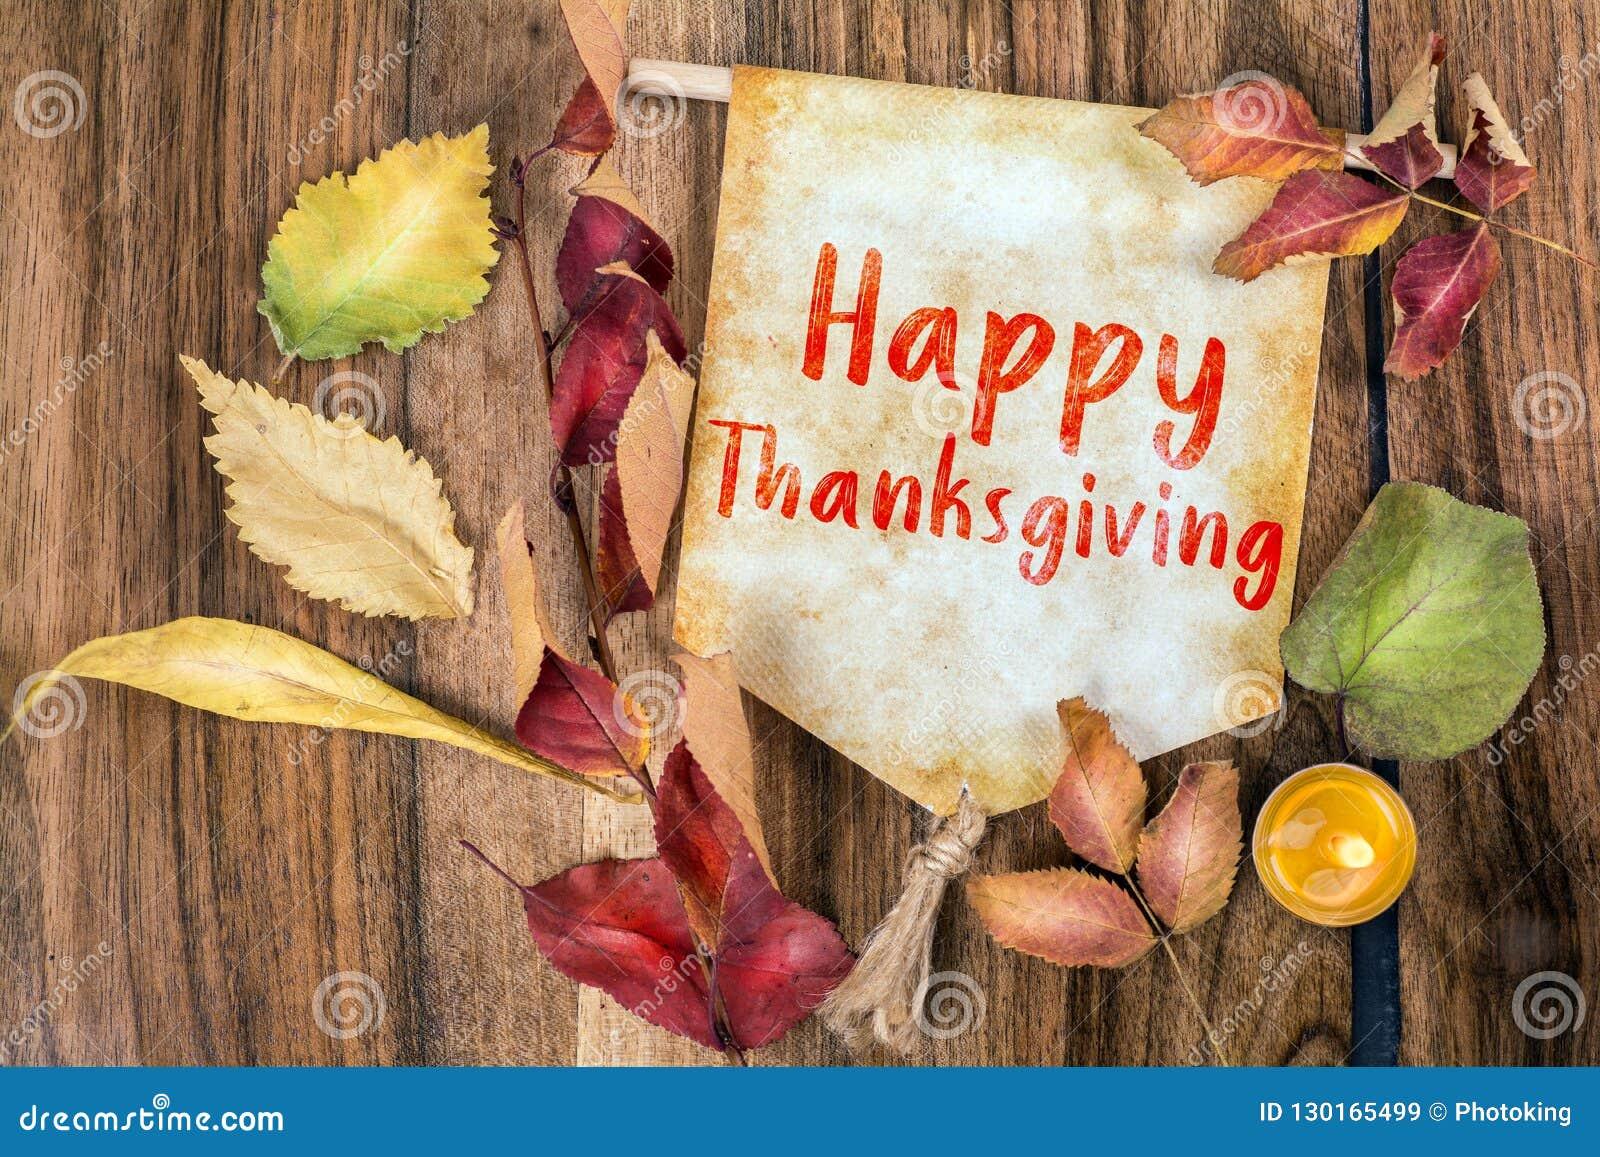 Happy thanksgiving text with autumn theme